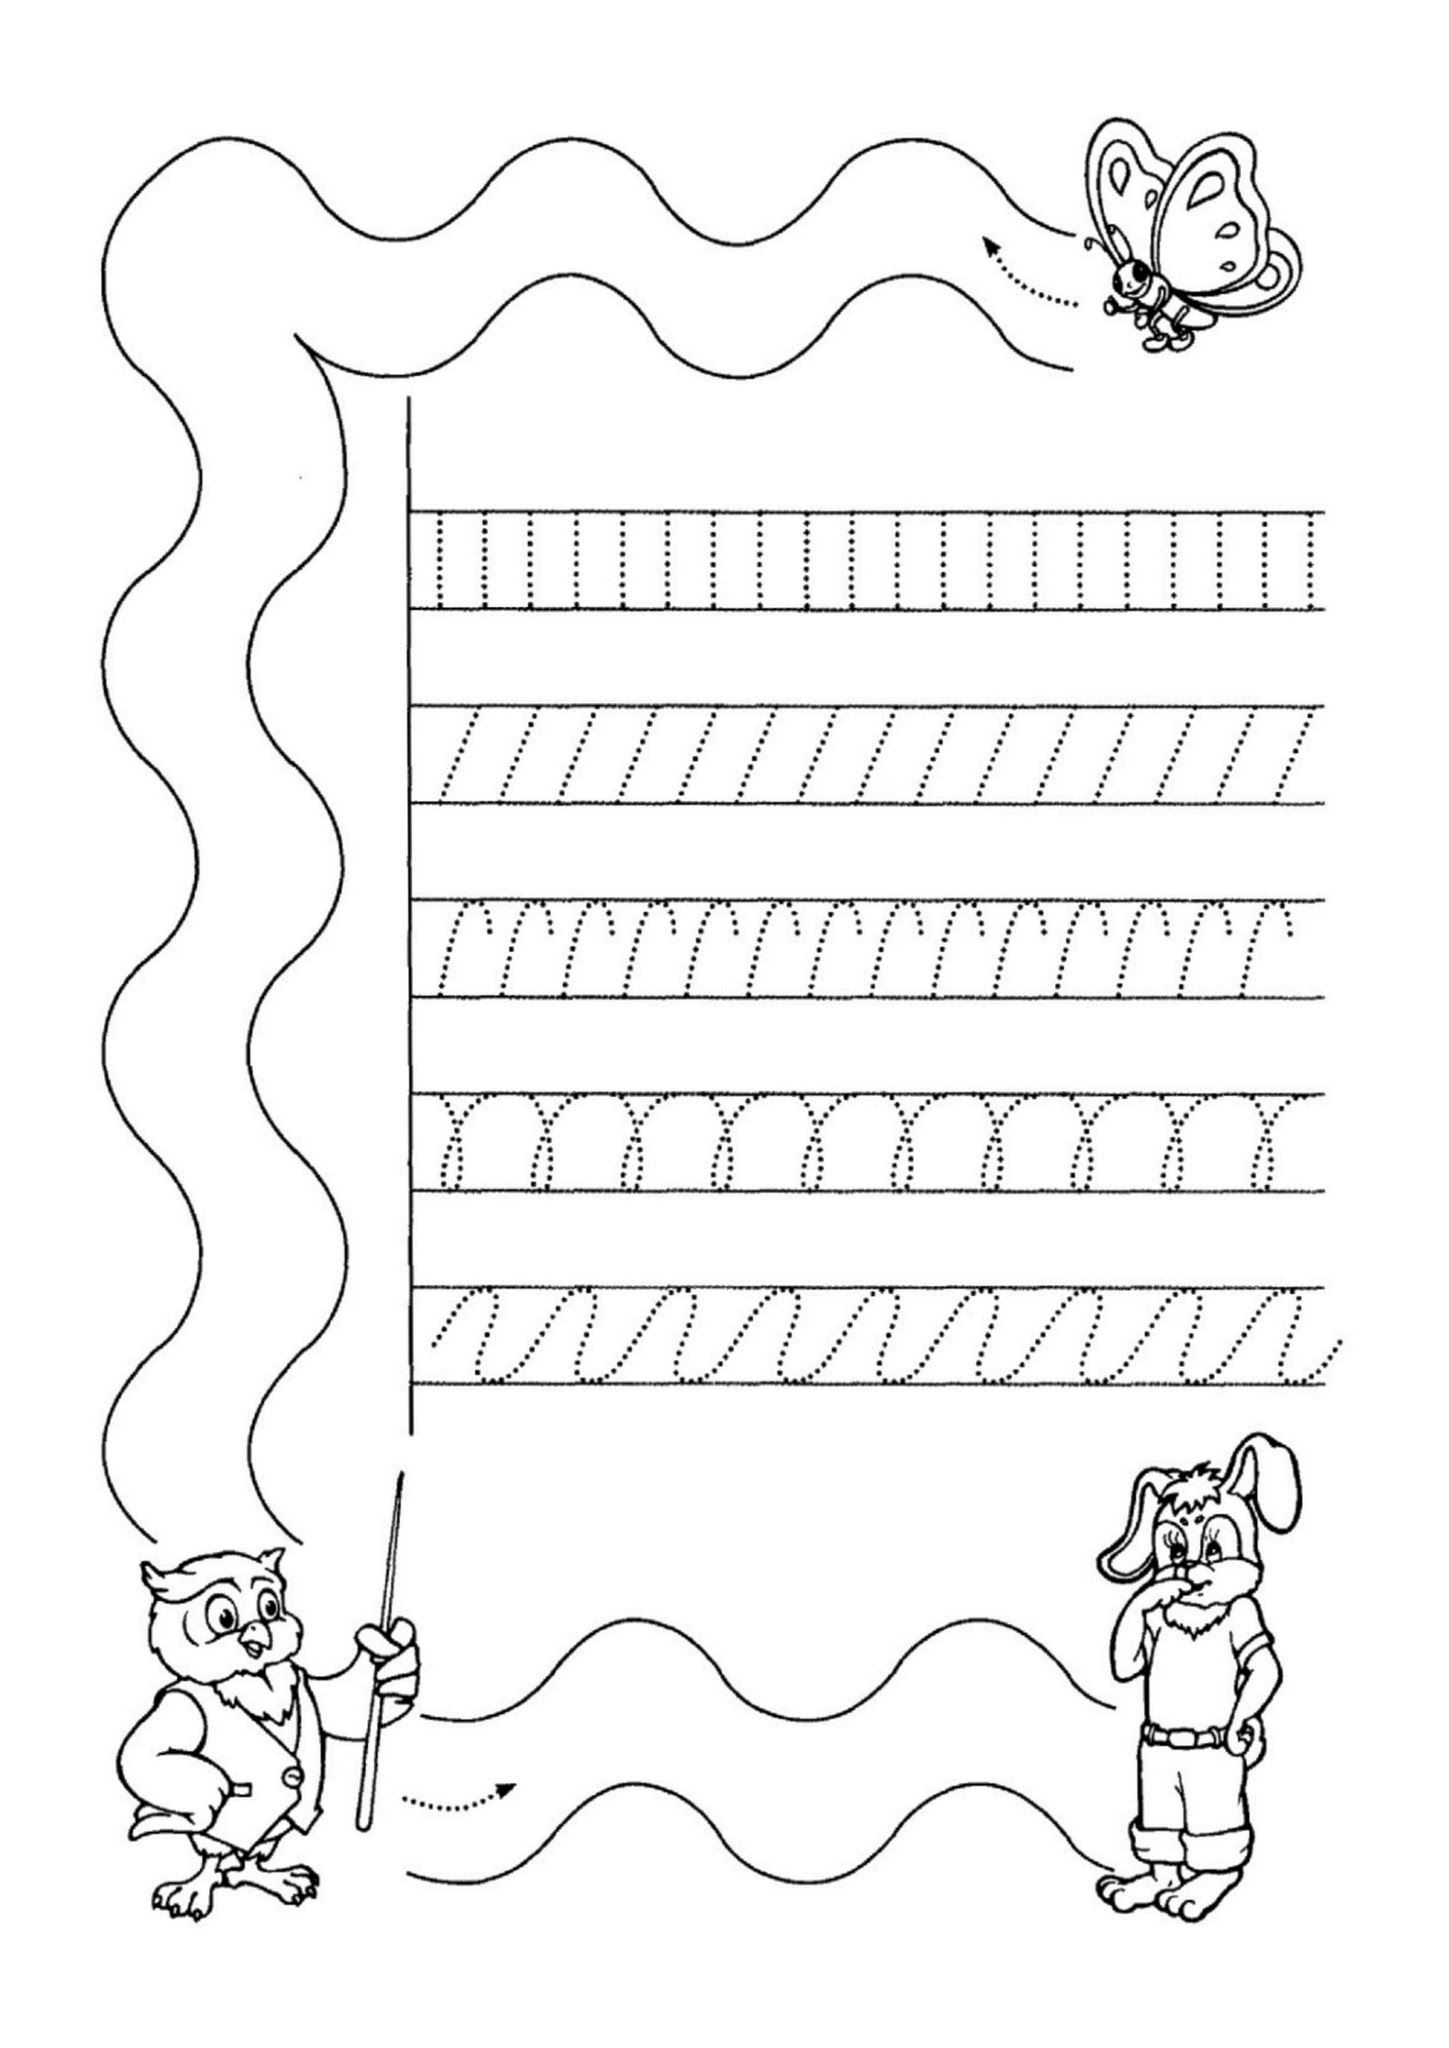 worksheet Fine Motor Skills Worksheets pin by i t on education graphomotor skills pinterest printable worksheets motor activities fine graphics